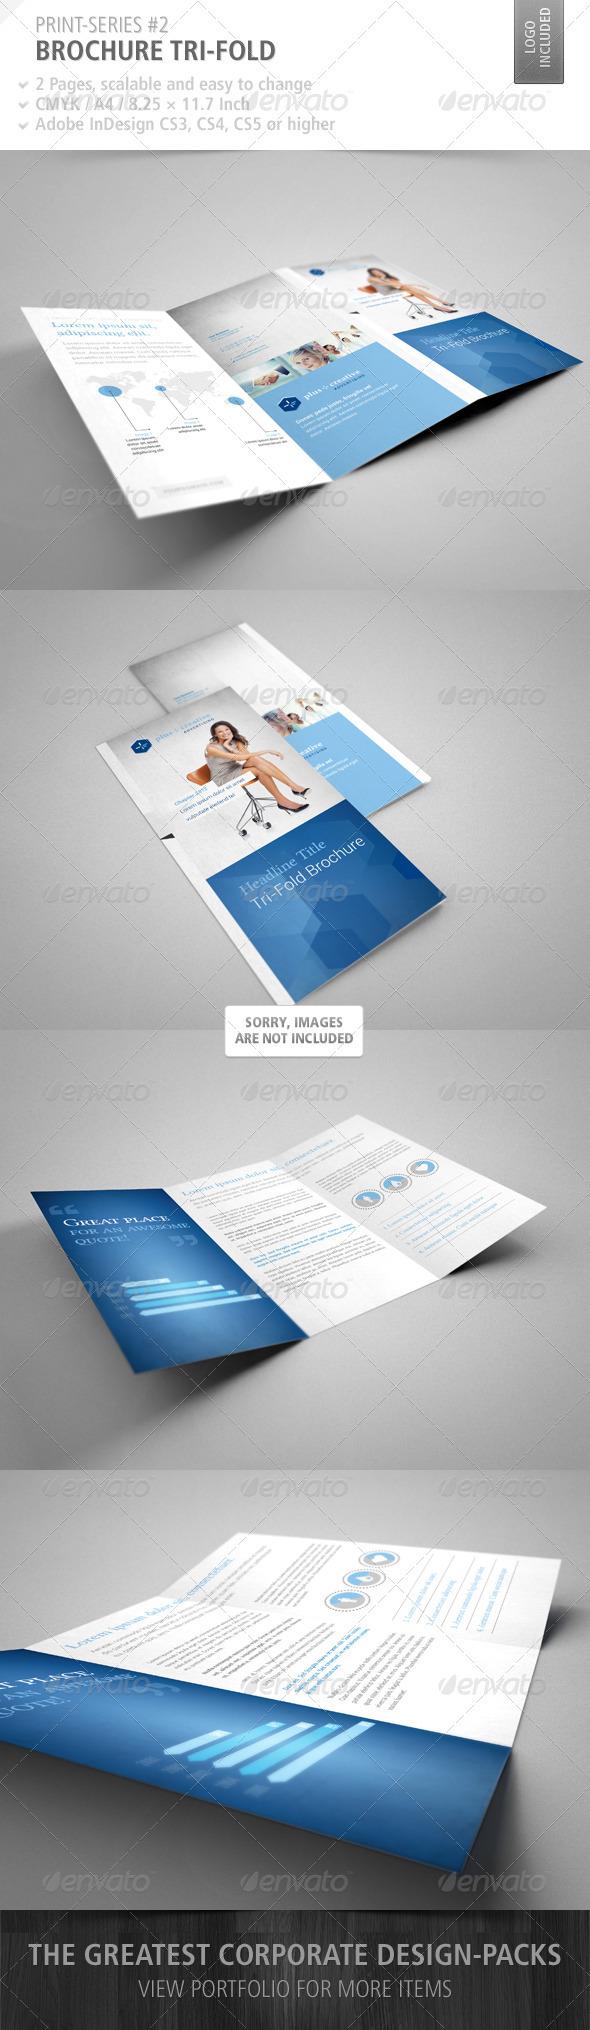 GraphicRiver Brochure Tri-Fold Print-Series #2 2555632